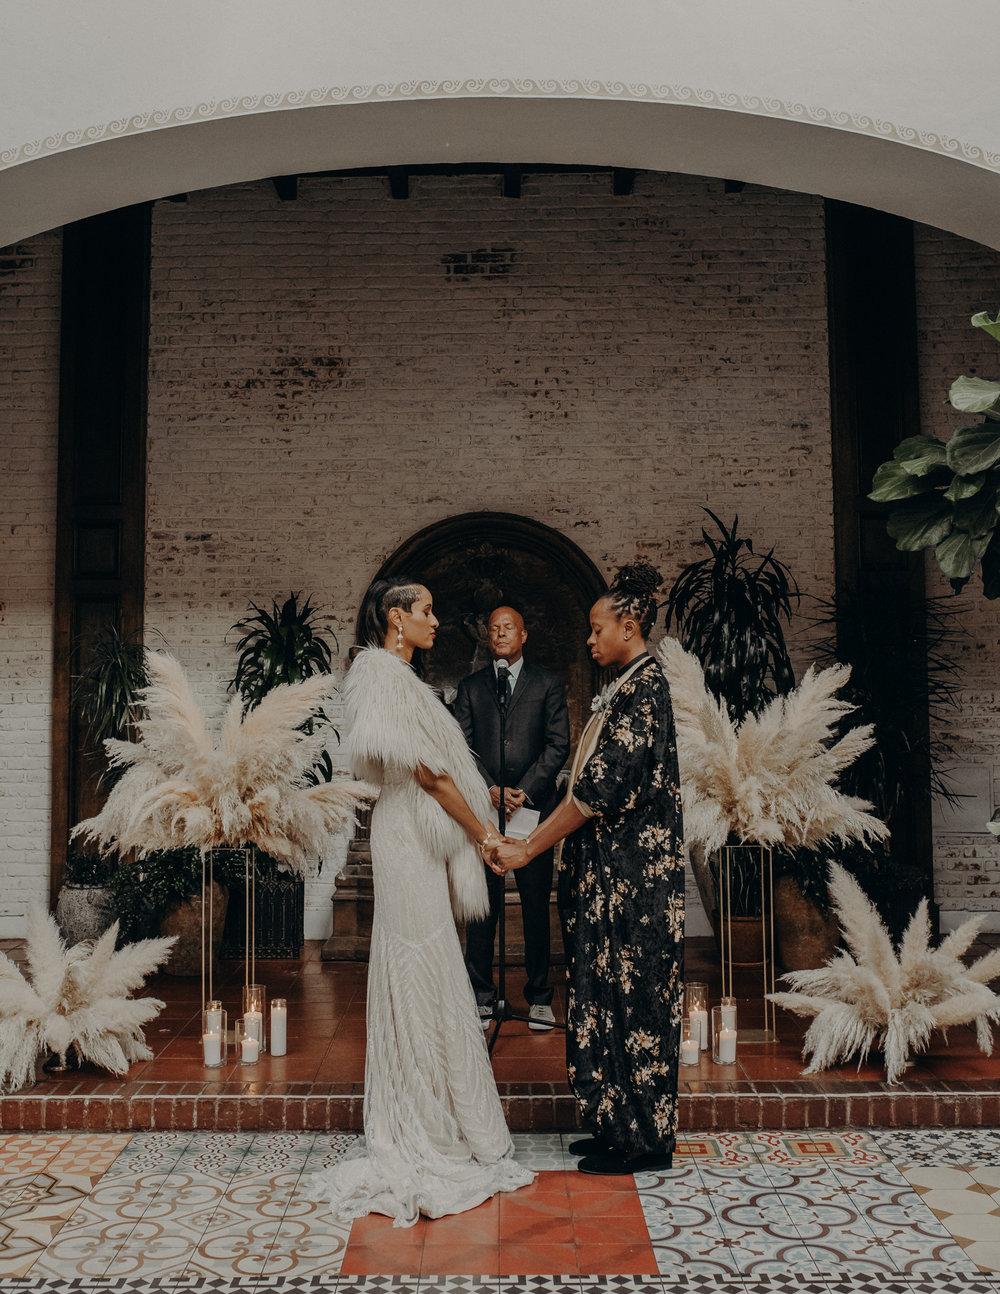 Wedding Photographer in Los Angeles - Ebell of Long Beach Wedding - LGBTQ weddings - lesbian wedding - IsaiahAndTaylor.com-093.jpg